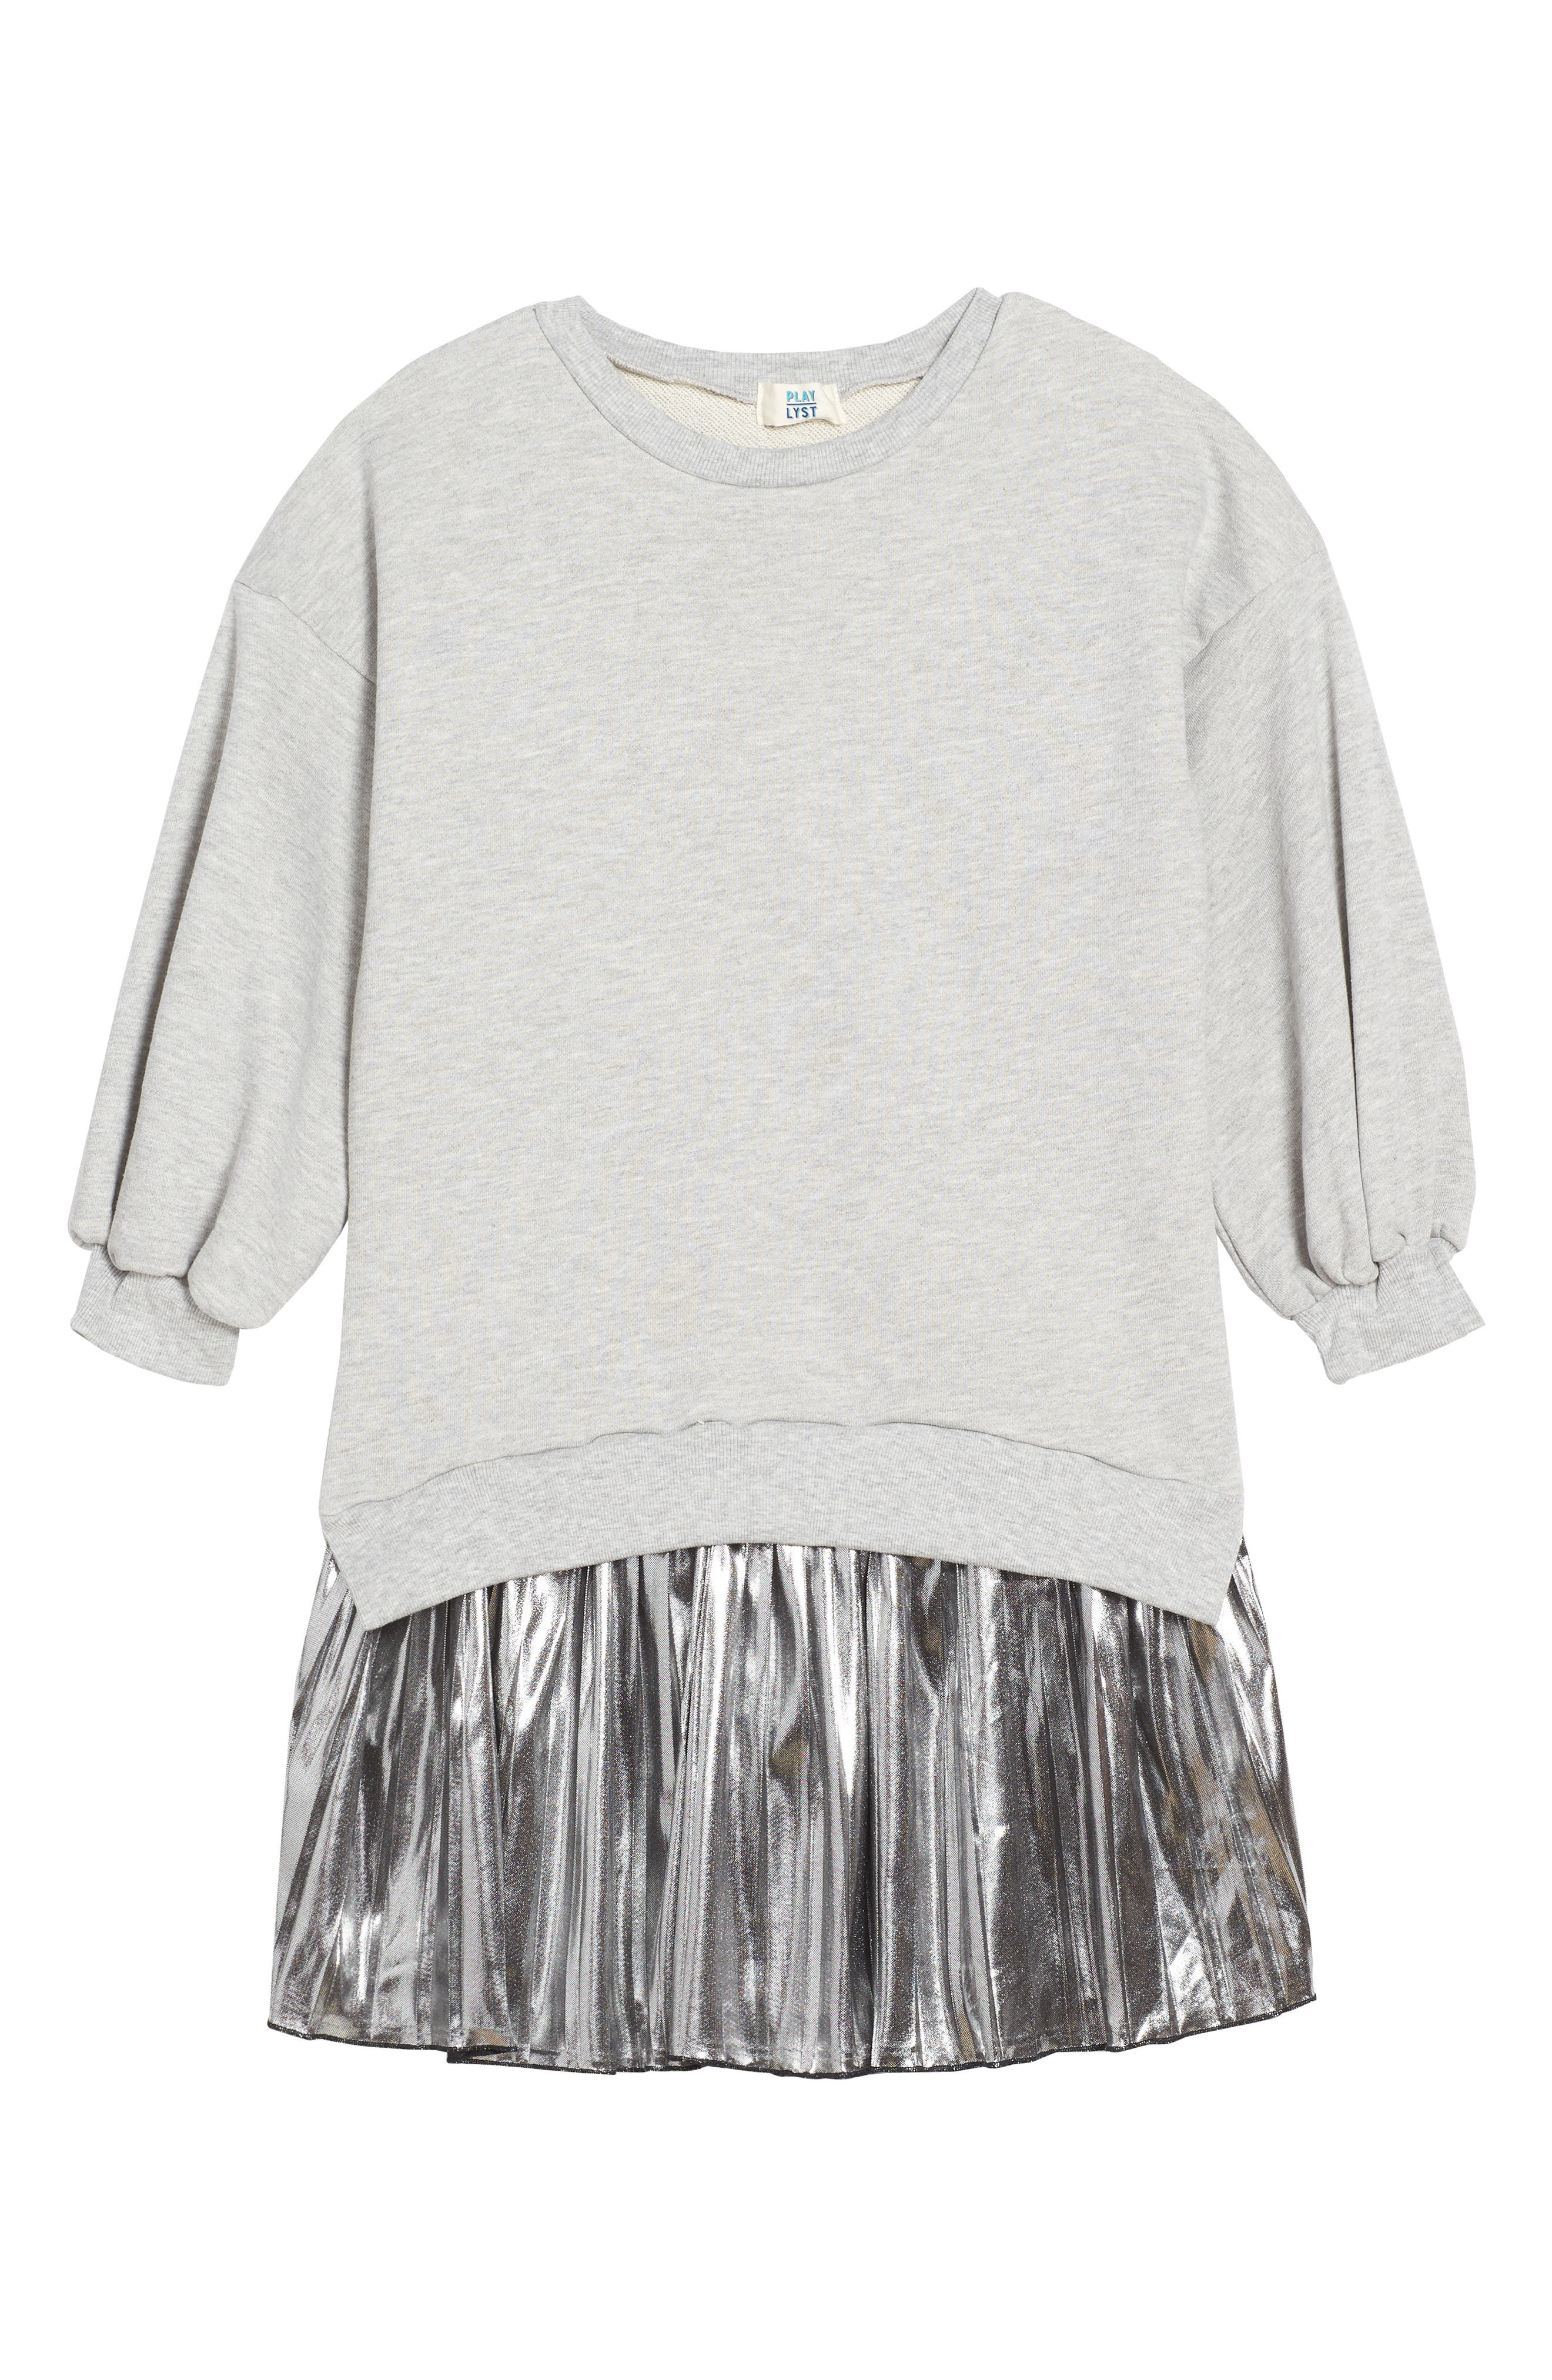 Metallic Sweatshirt Dress,                         Main,                         color, 020